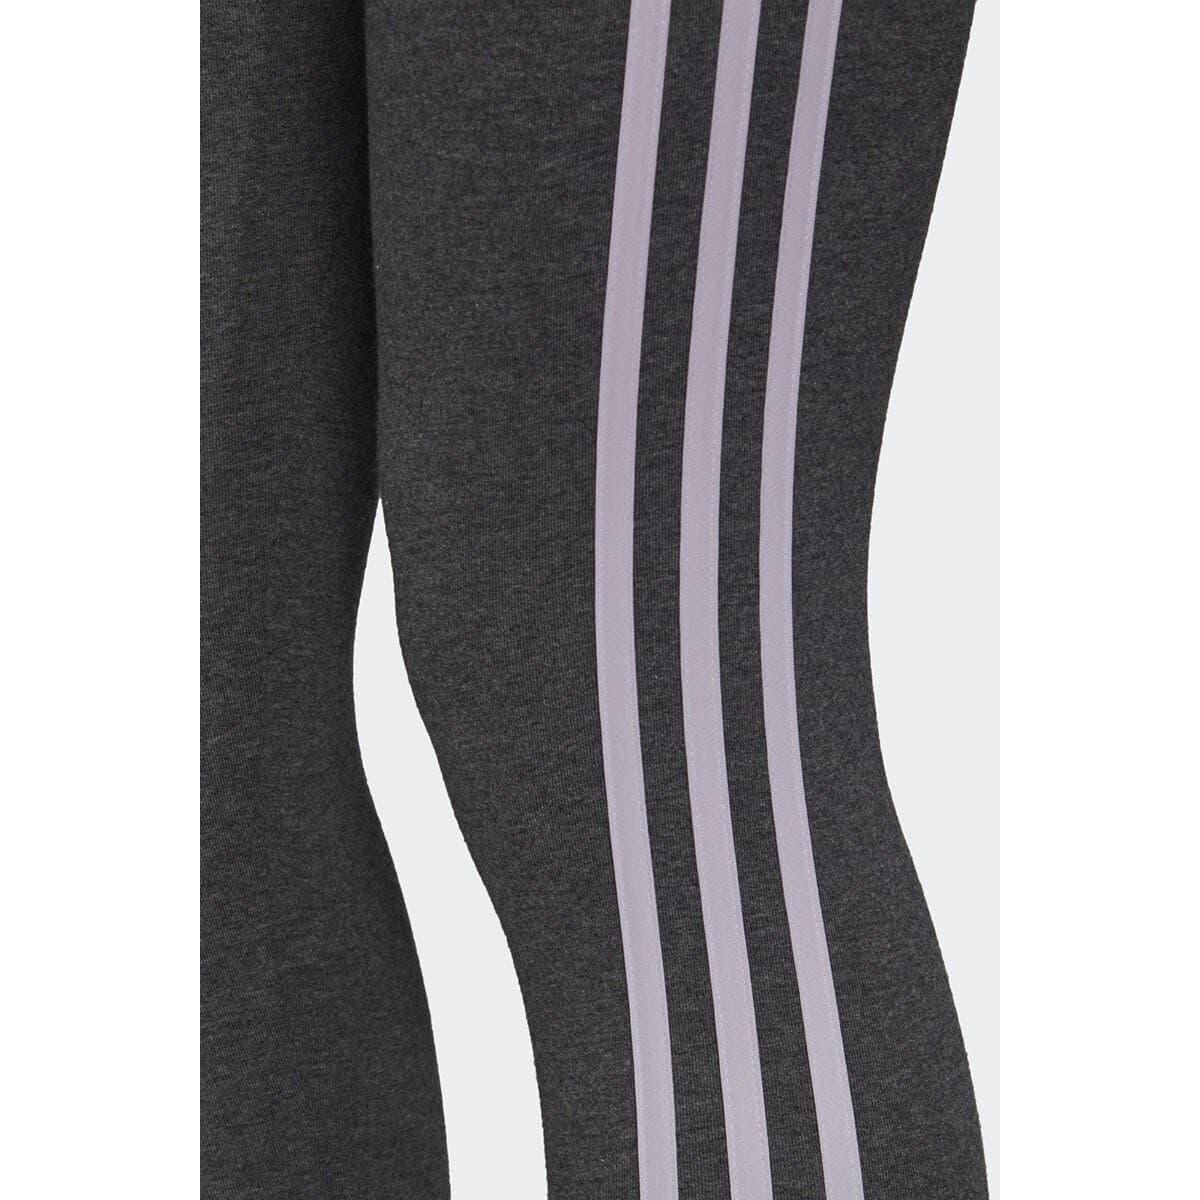 adidas Essentials 3 Bantlı Kadın Gri Tayt (FM6699)